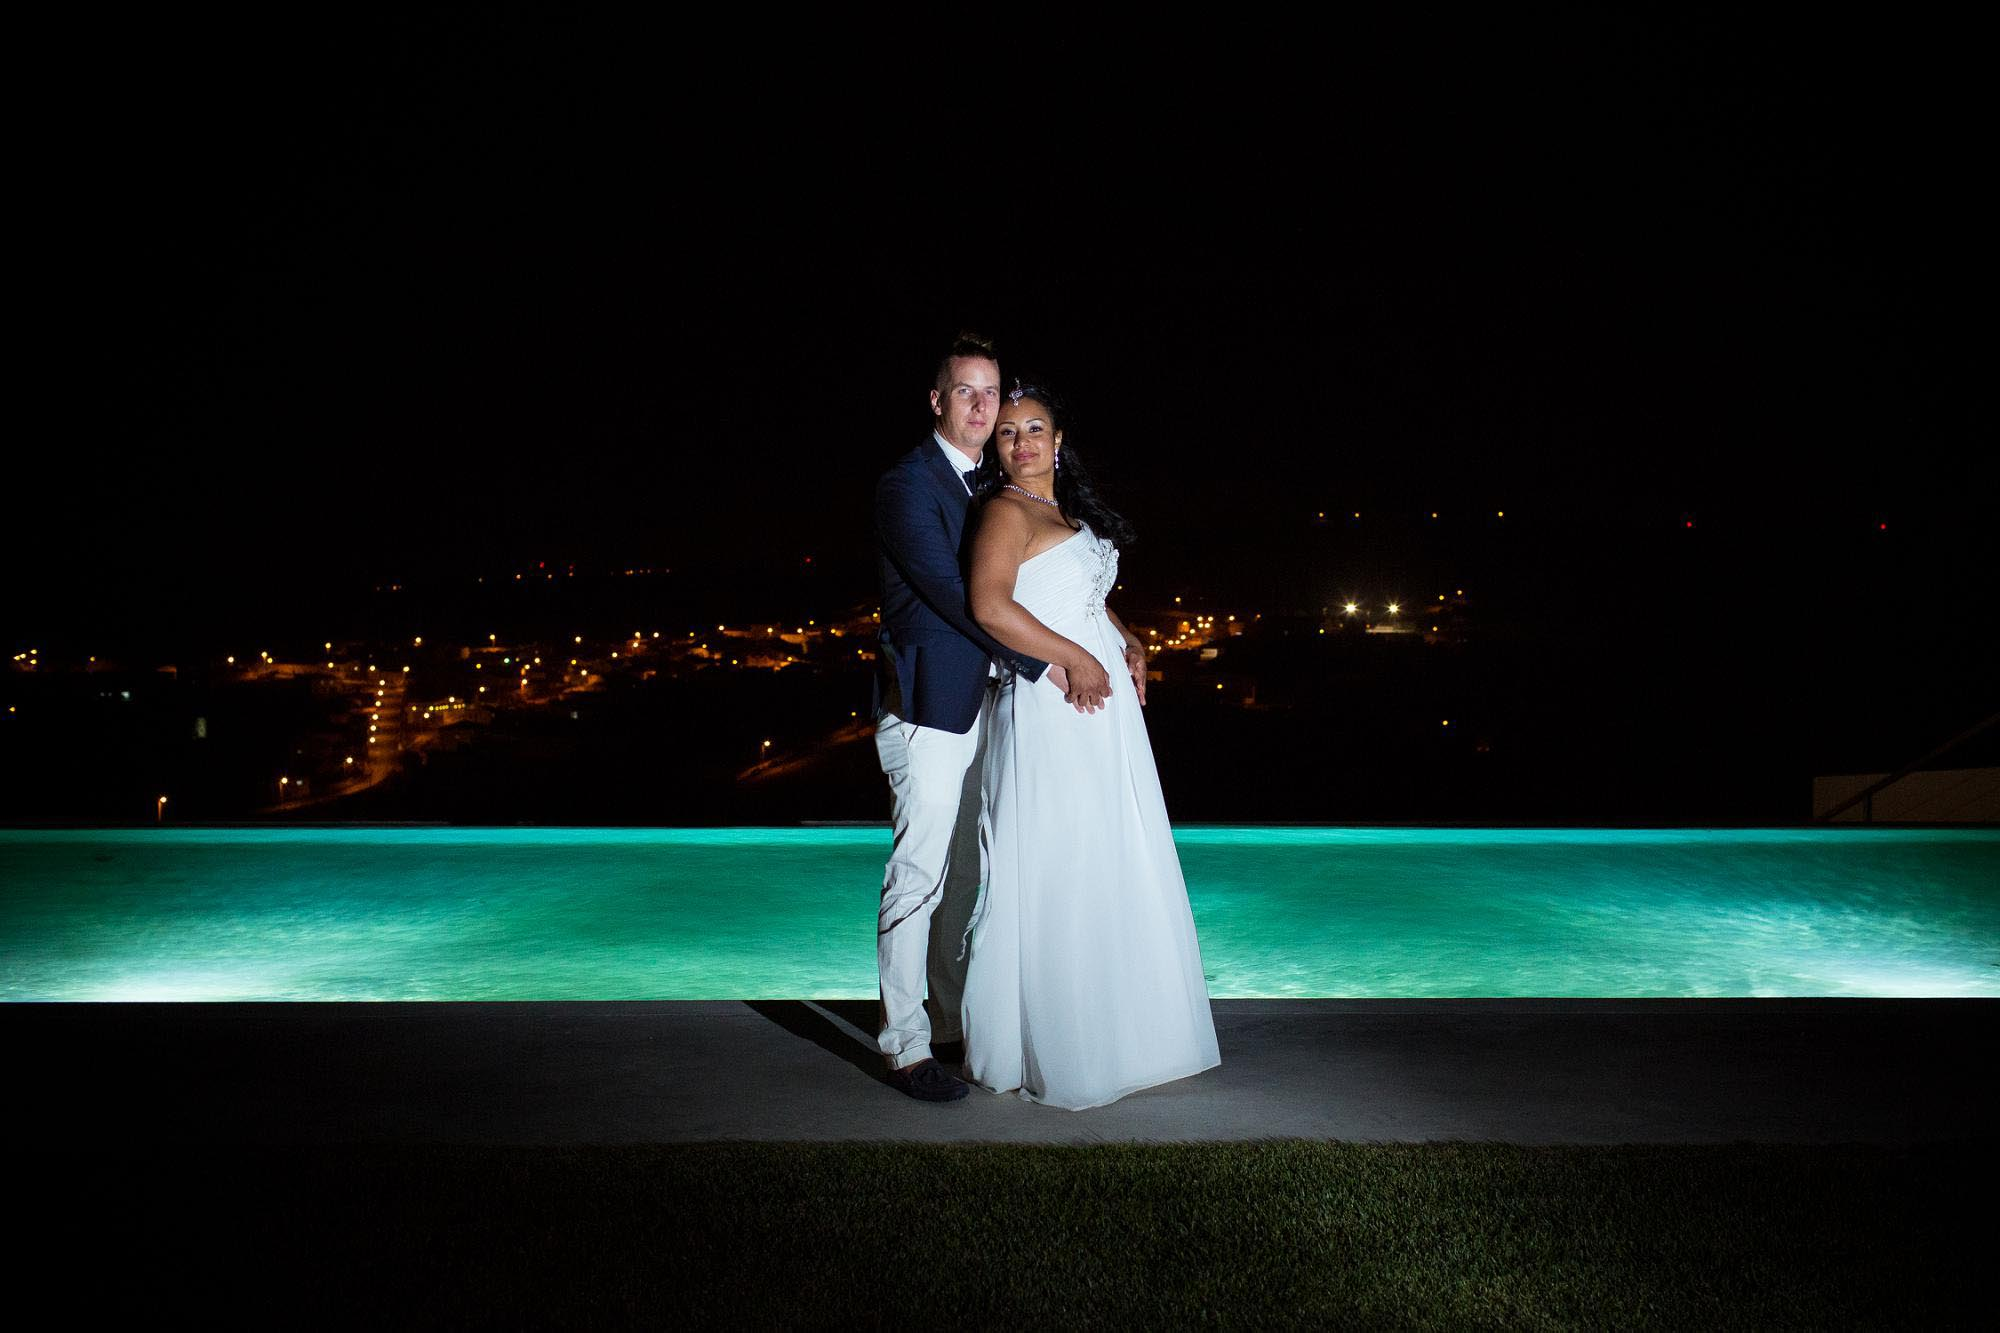 Portugal-Wedding-Photographer-235.jpg